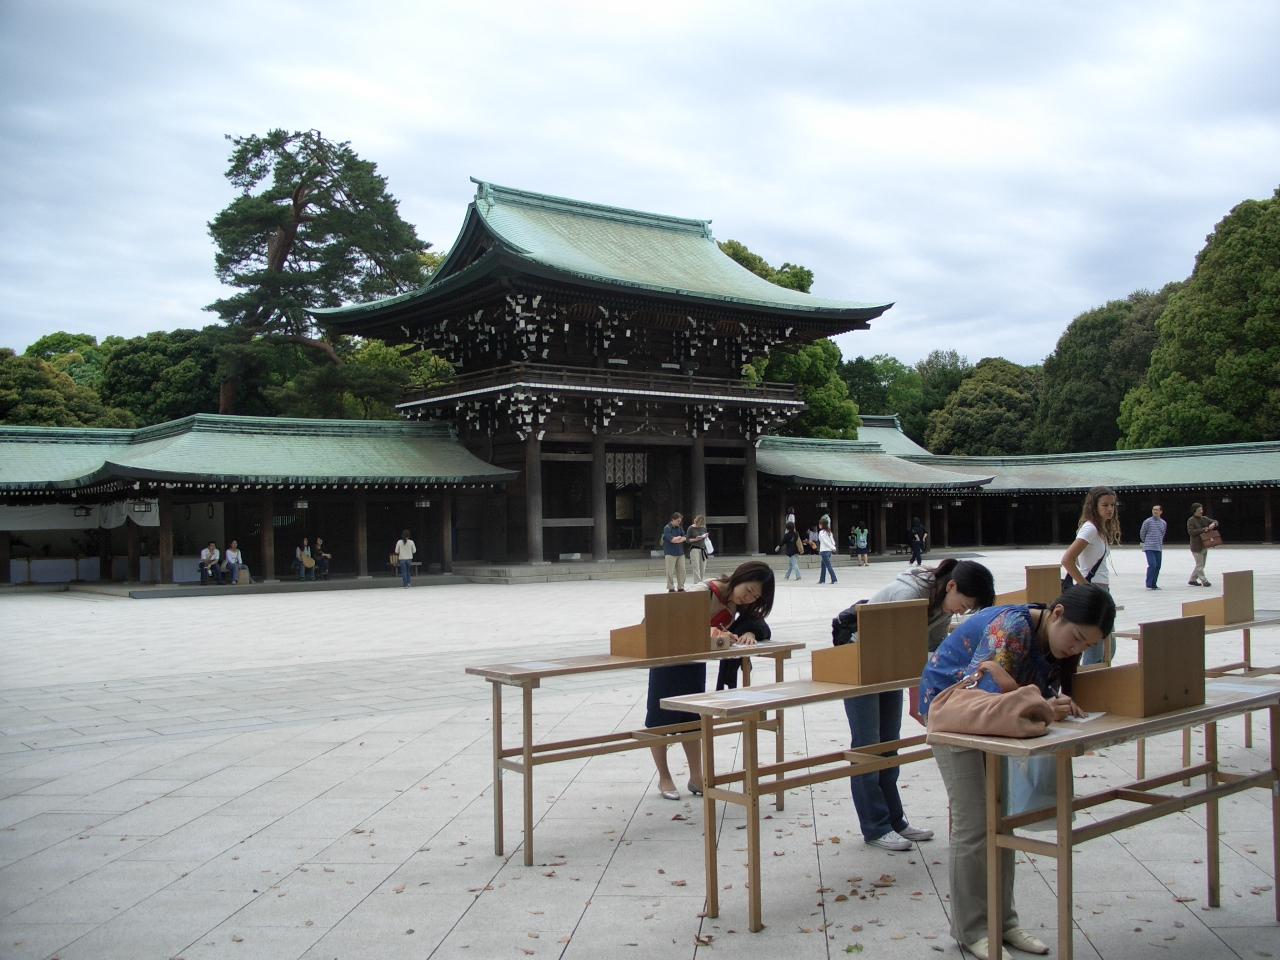 File:Meiji Shrine Tokyo, Japan.jpg - Wikimedia Commons